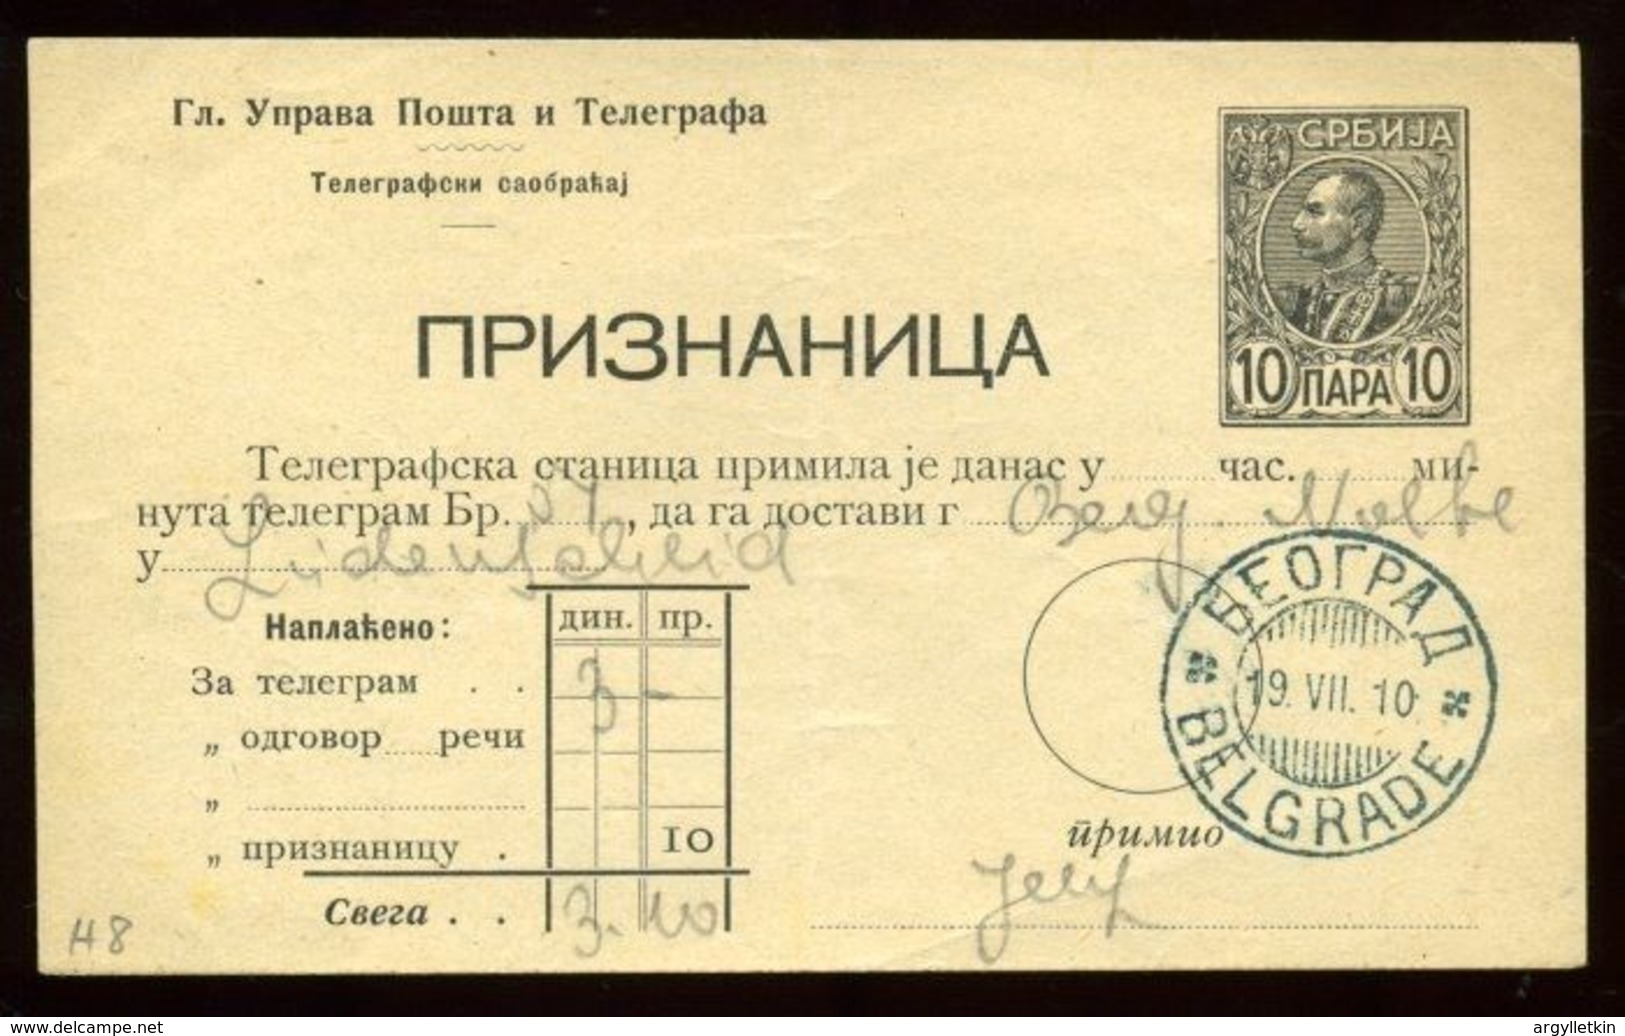 SERBIA POSTAL STATIONERY 1910 - Serbia